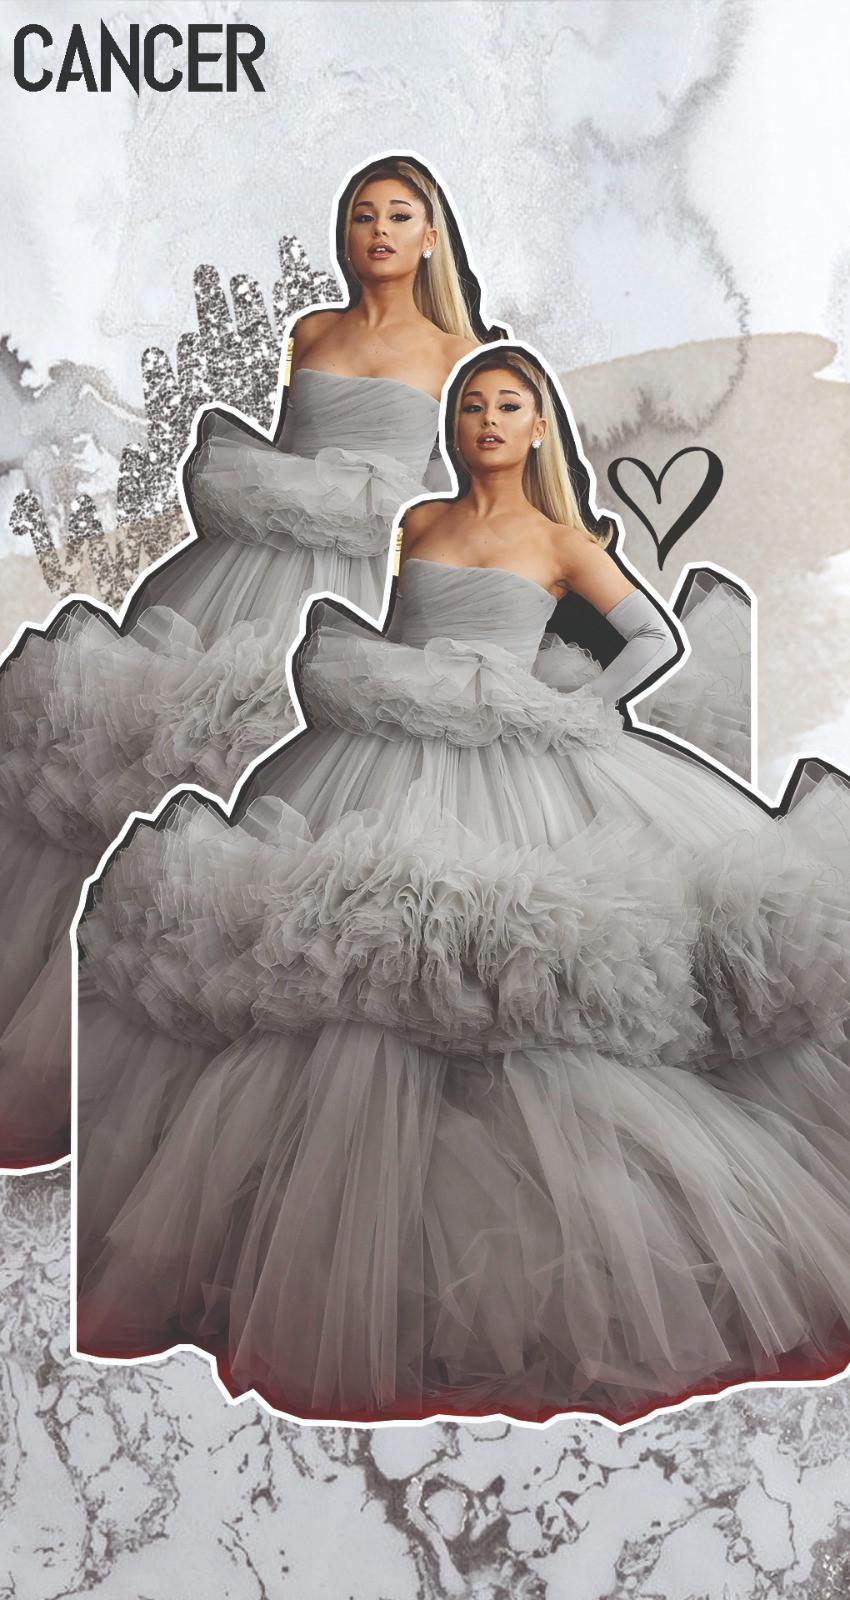 Ariana Grande image via Frazer Harrison/Getty Images